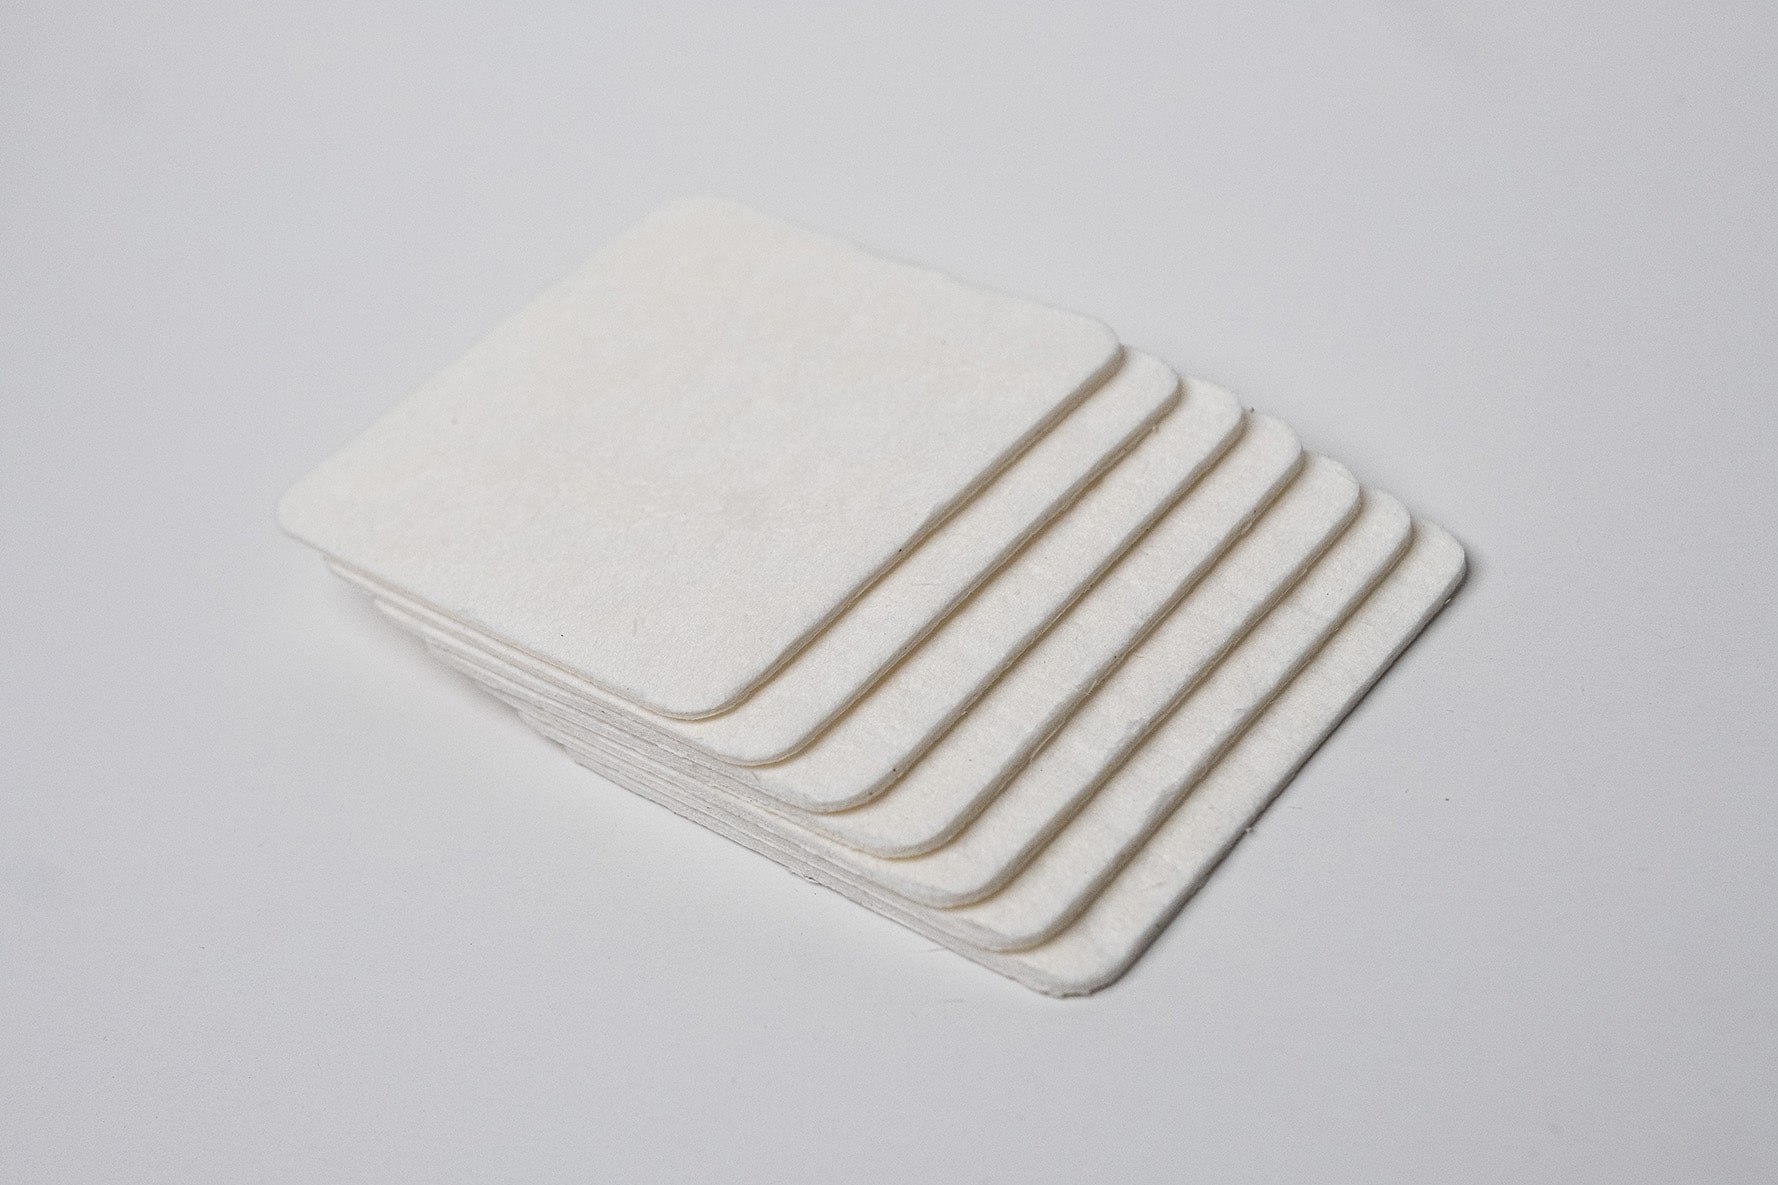 absorbent paper - blotter paper